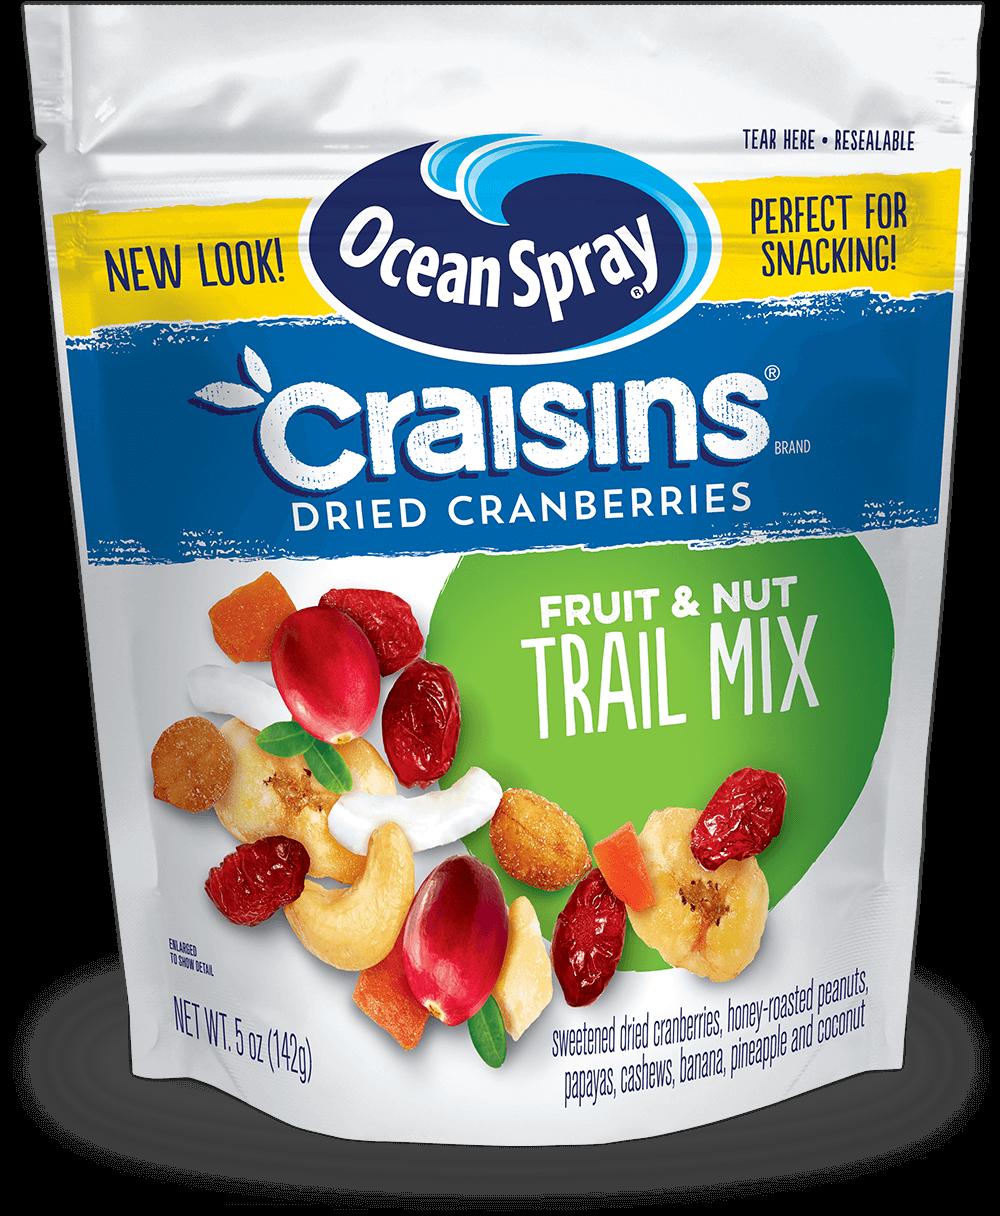 Craisins® Dried Cranberries Trail Mix